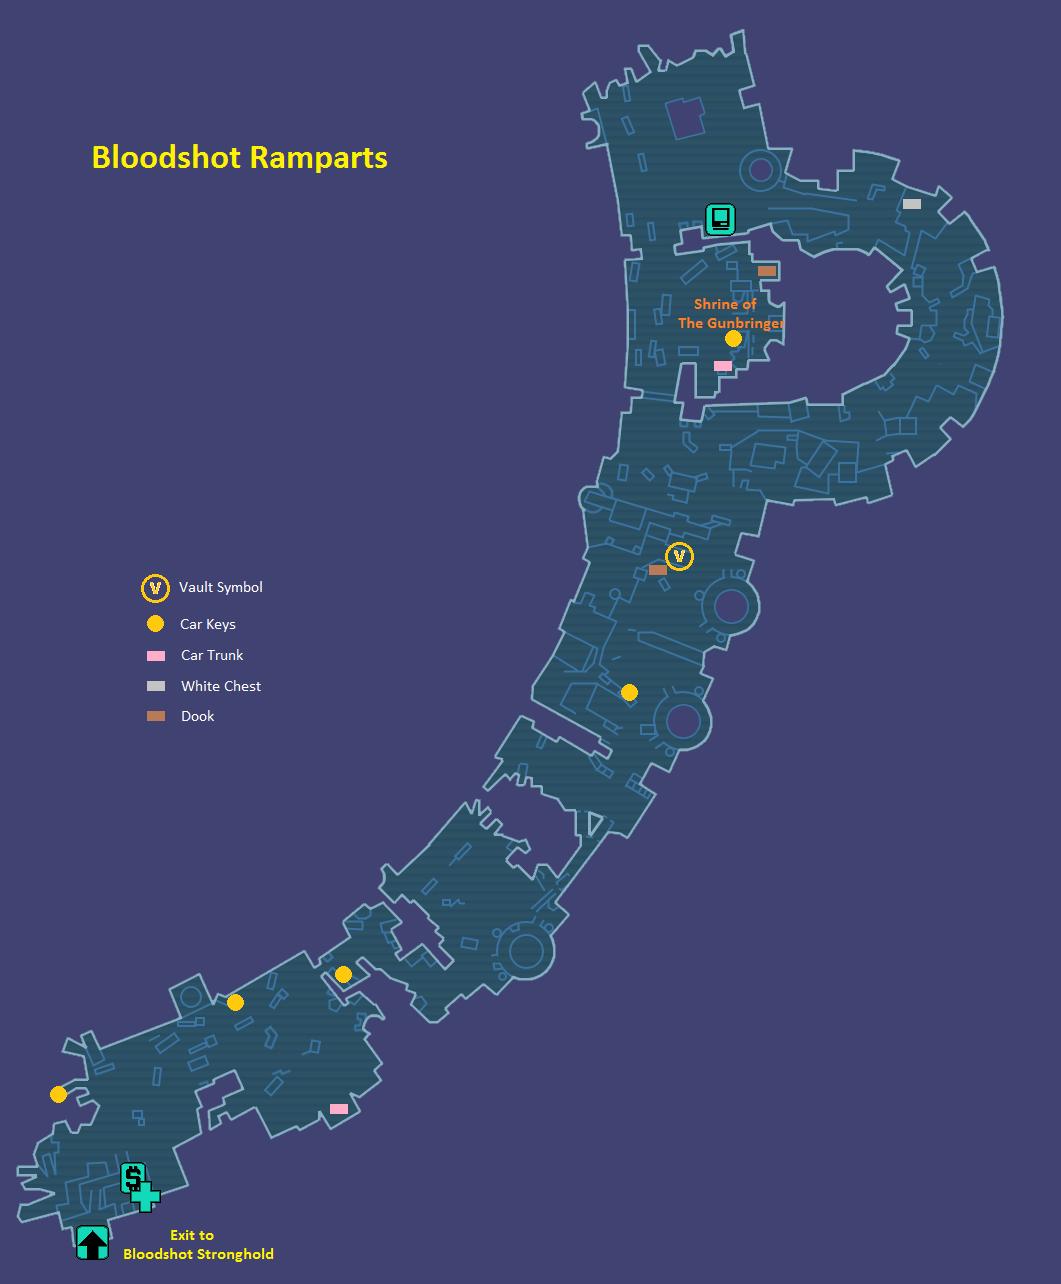 Bloodshot Ramparts | Borderlands Wiki | FANDOM powered by Wikia